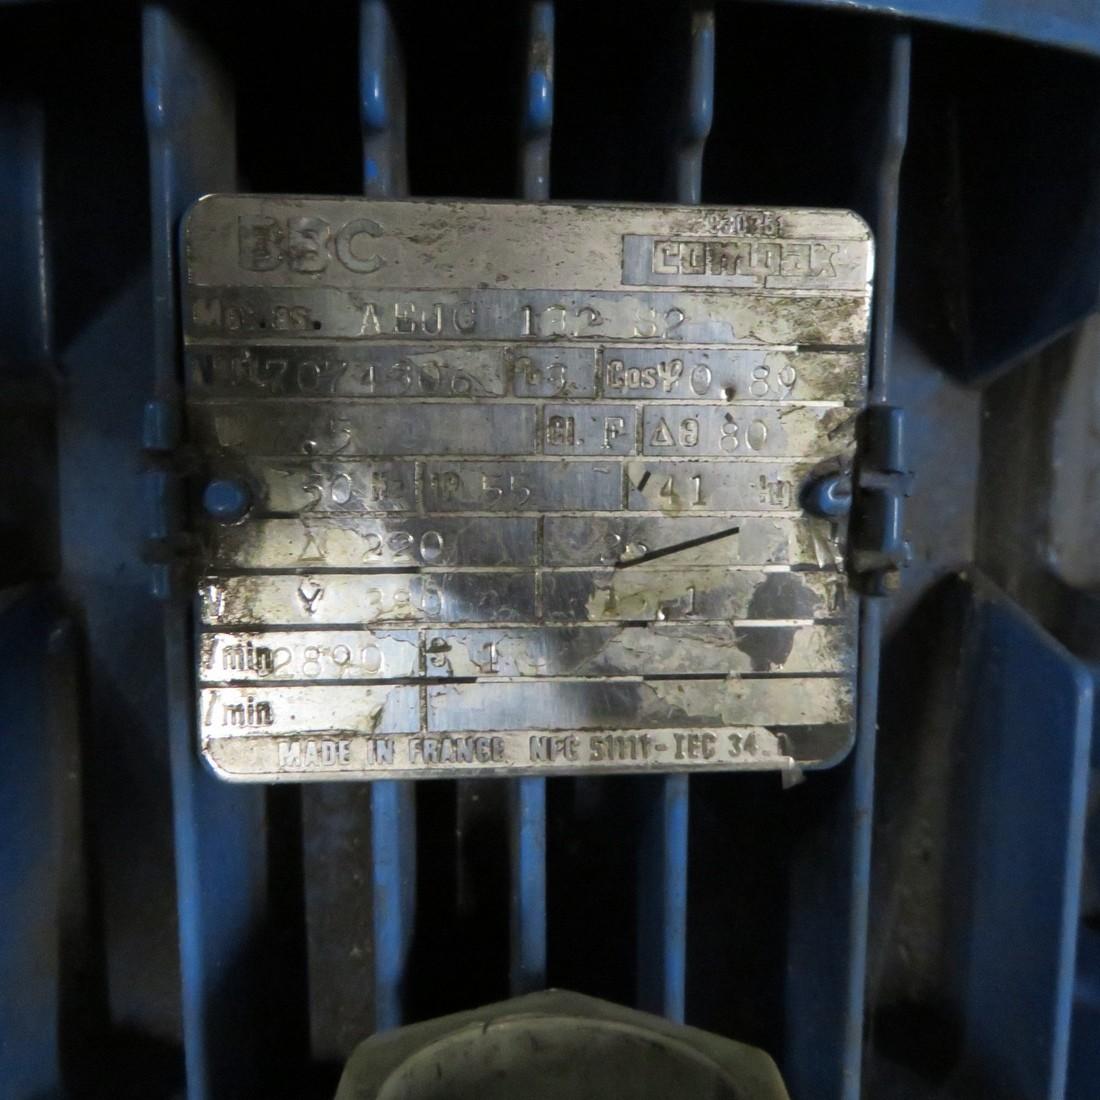 R10VA1294 Stainless steel PIERRE GUERIN centrifugal pump - Hp10 - Rpm3000